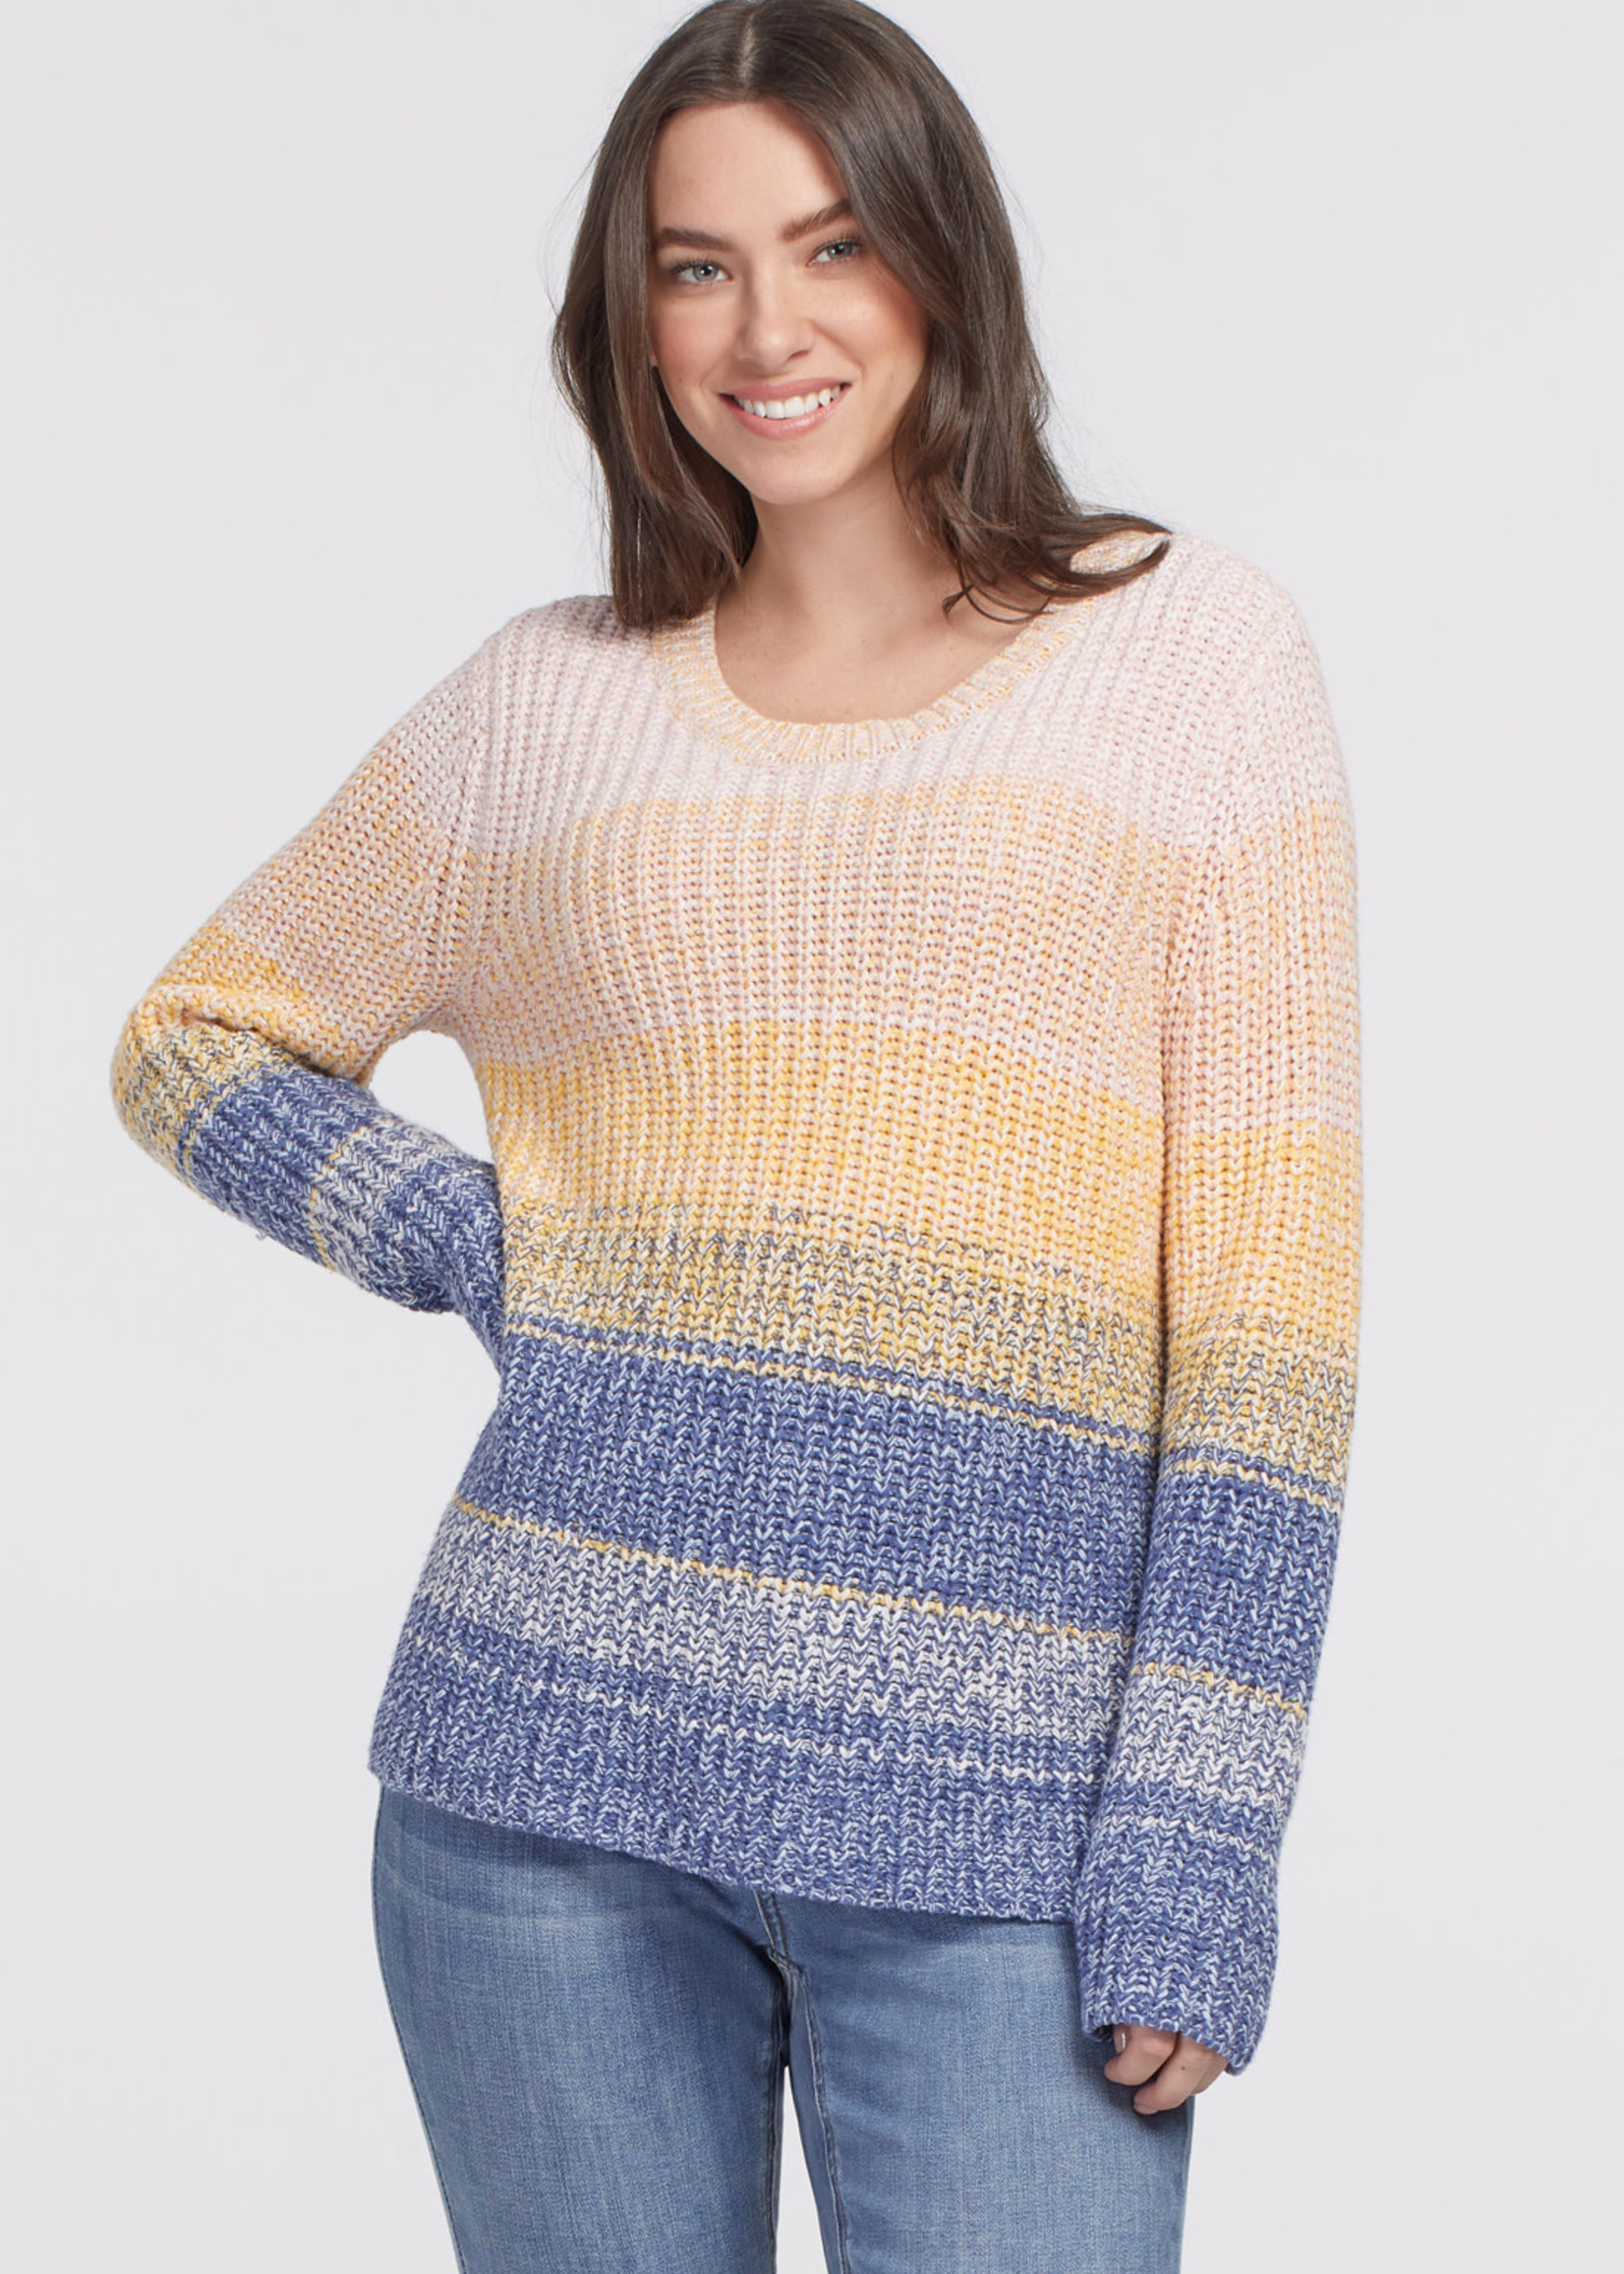 Tribal Tribal L/S Crew Neck Sweater